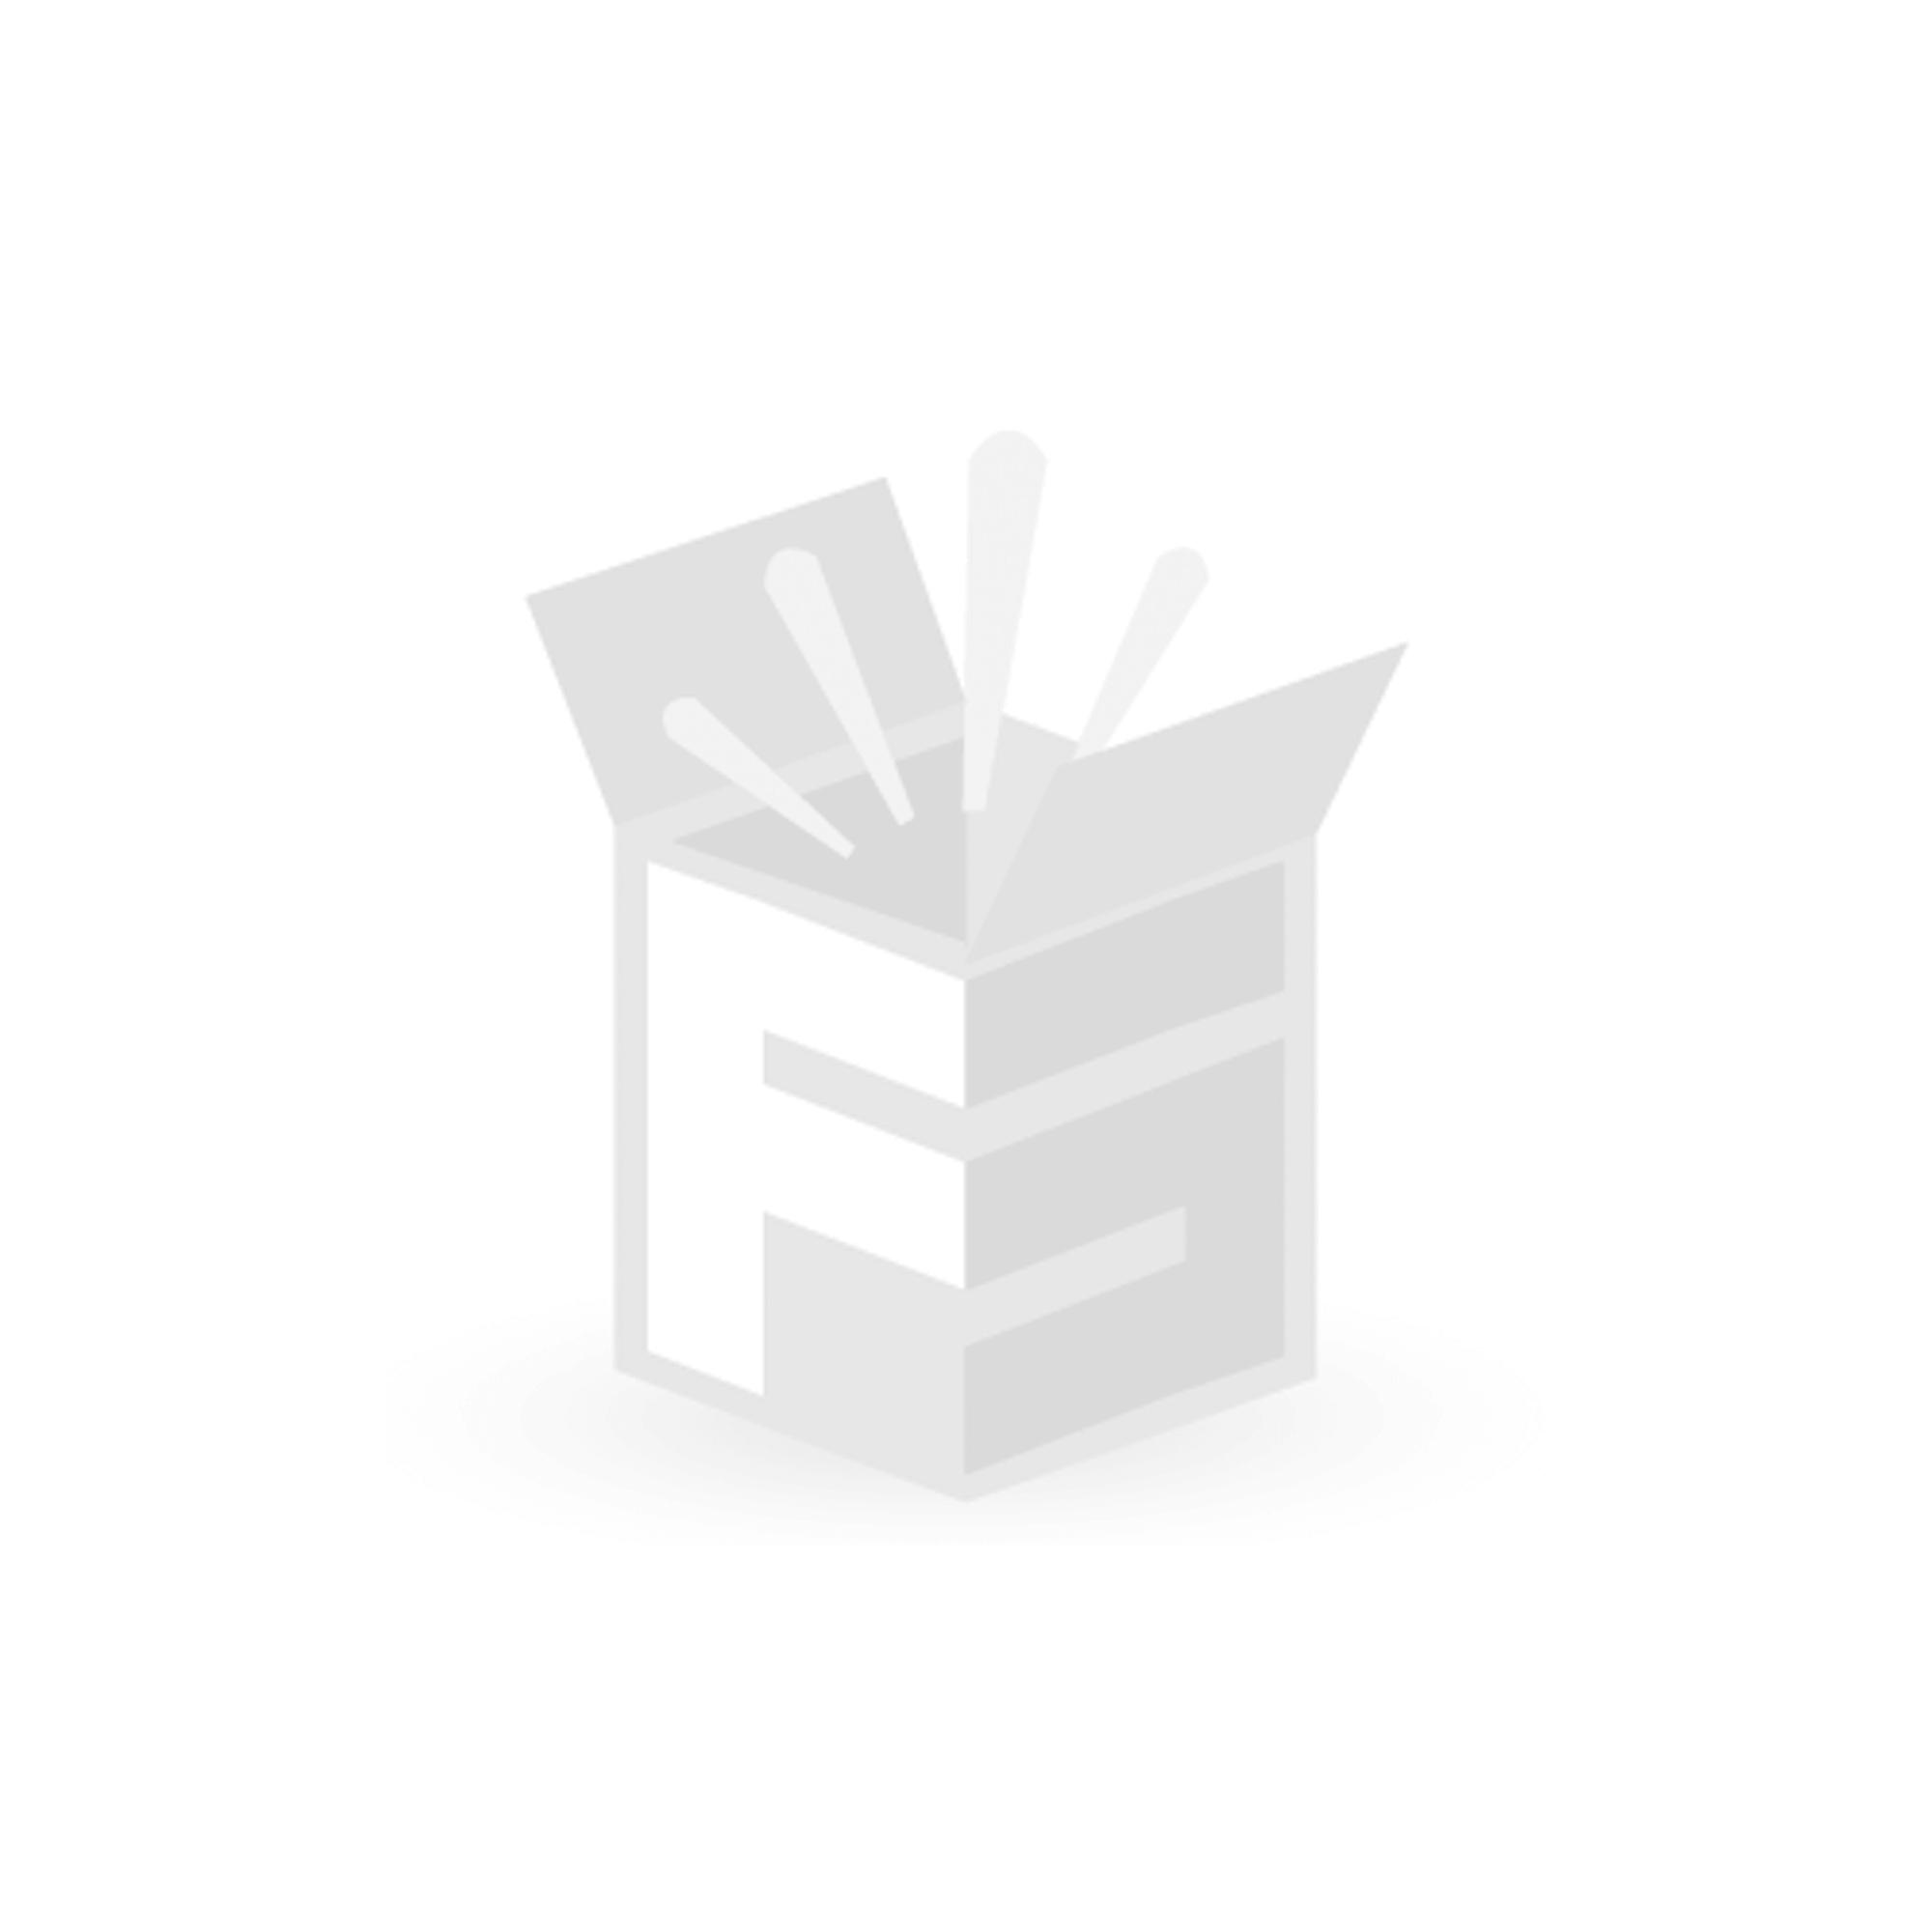 Bosch L-Boxx Mini Professional, inkl. 3x 25 Stichsägeblätter